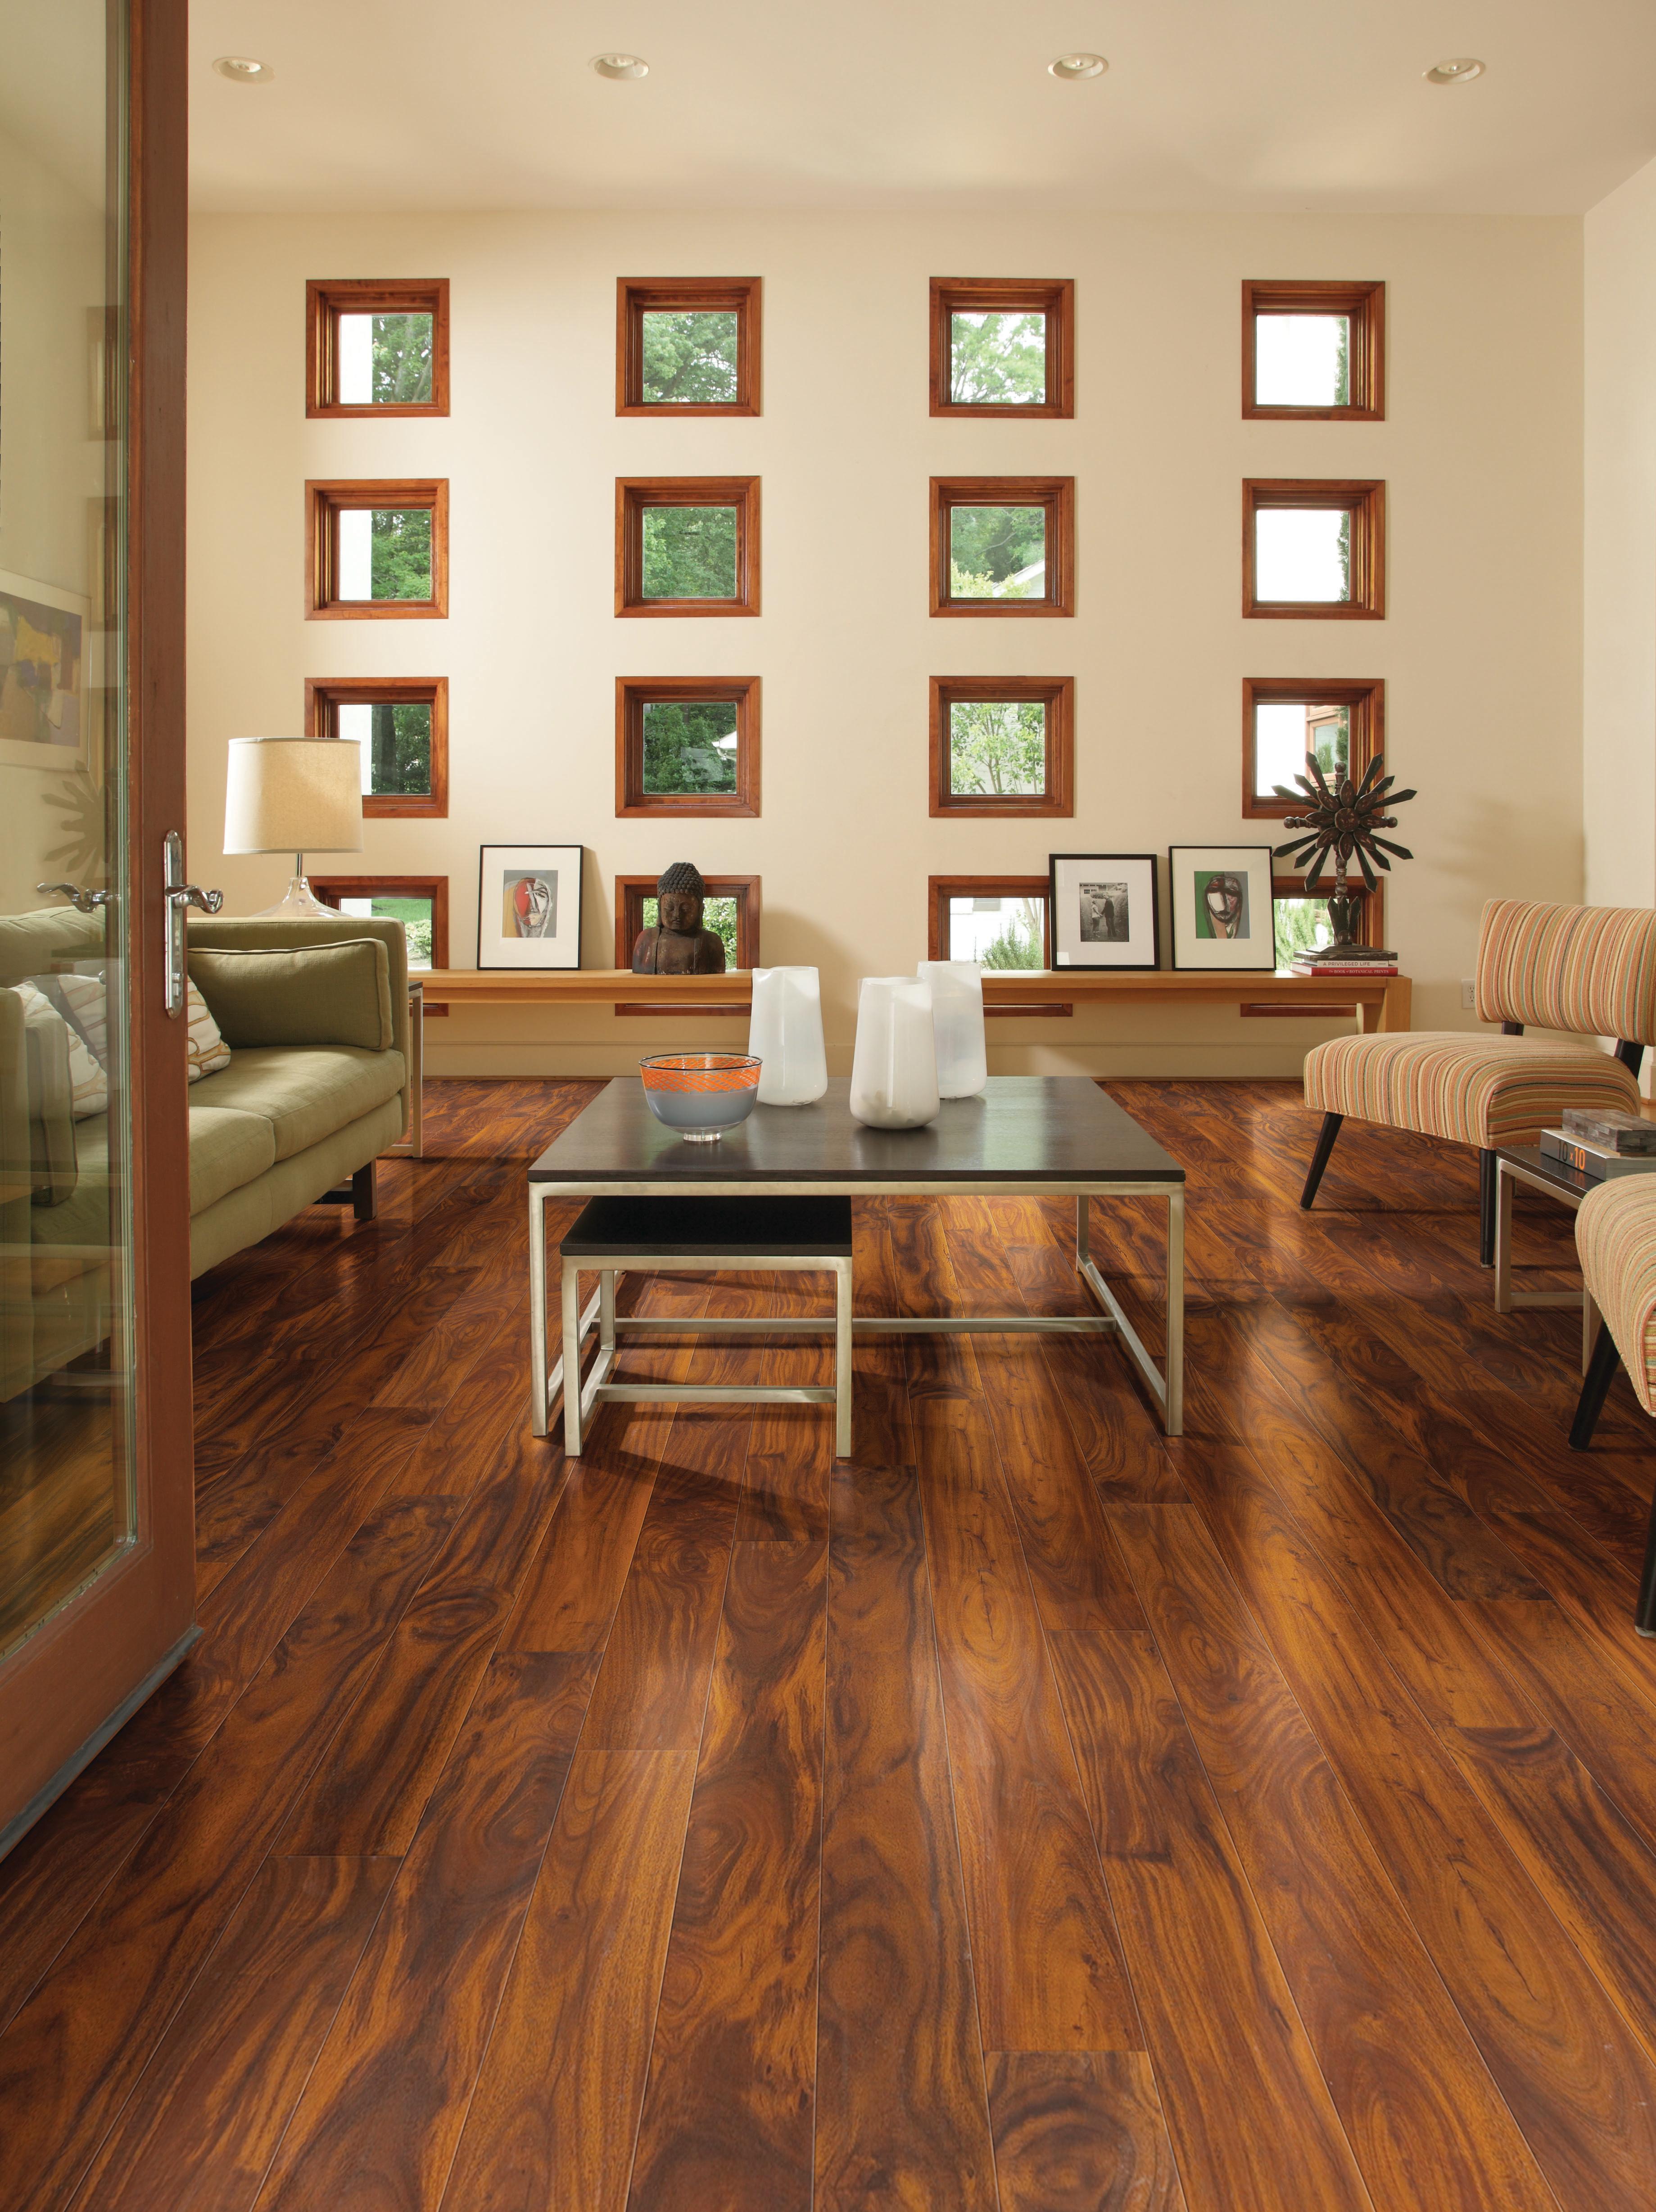 Lawrence Flooring & Interiors image 0